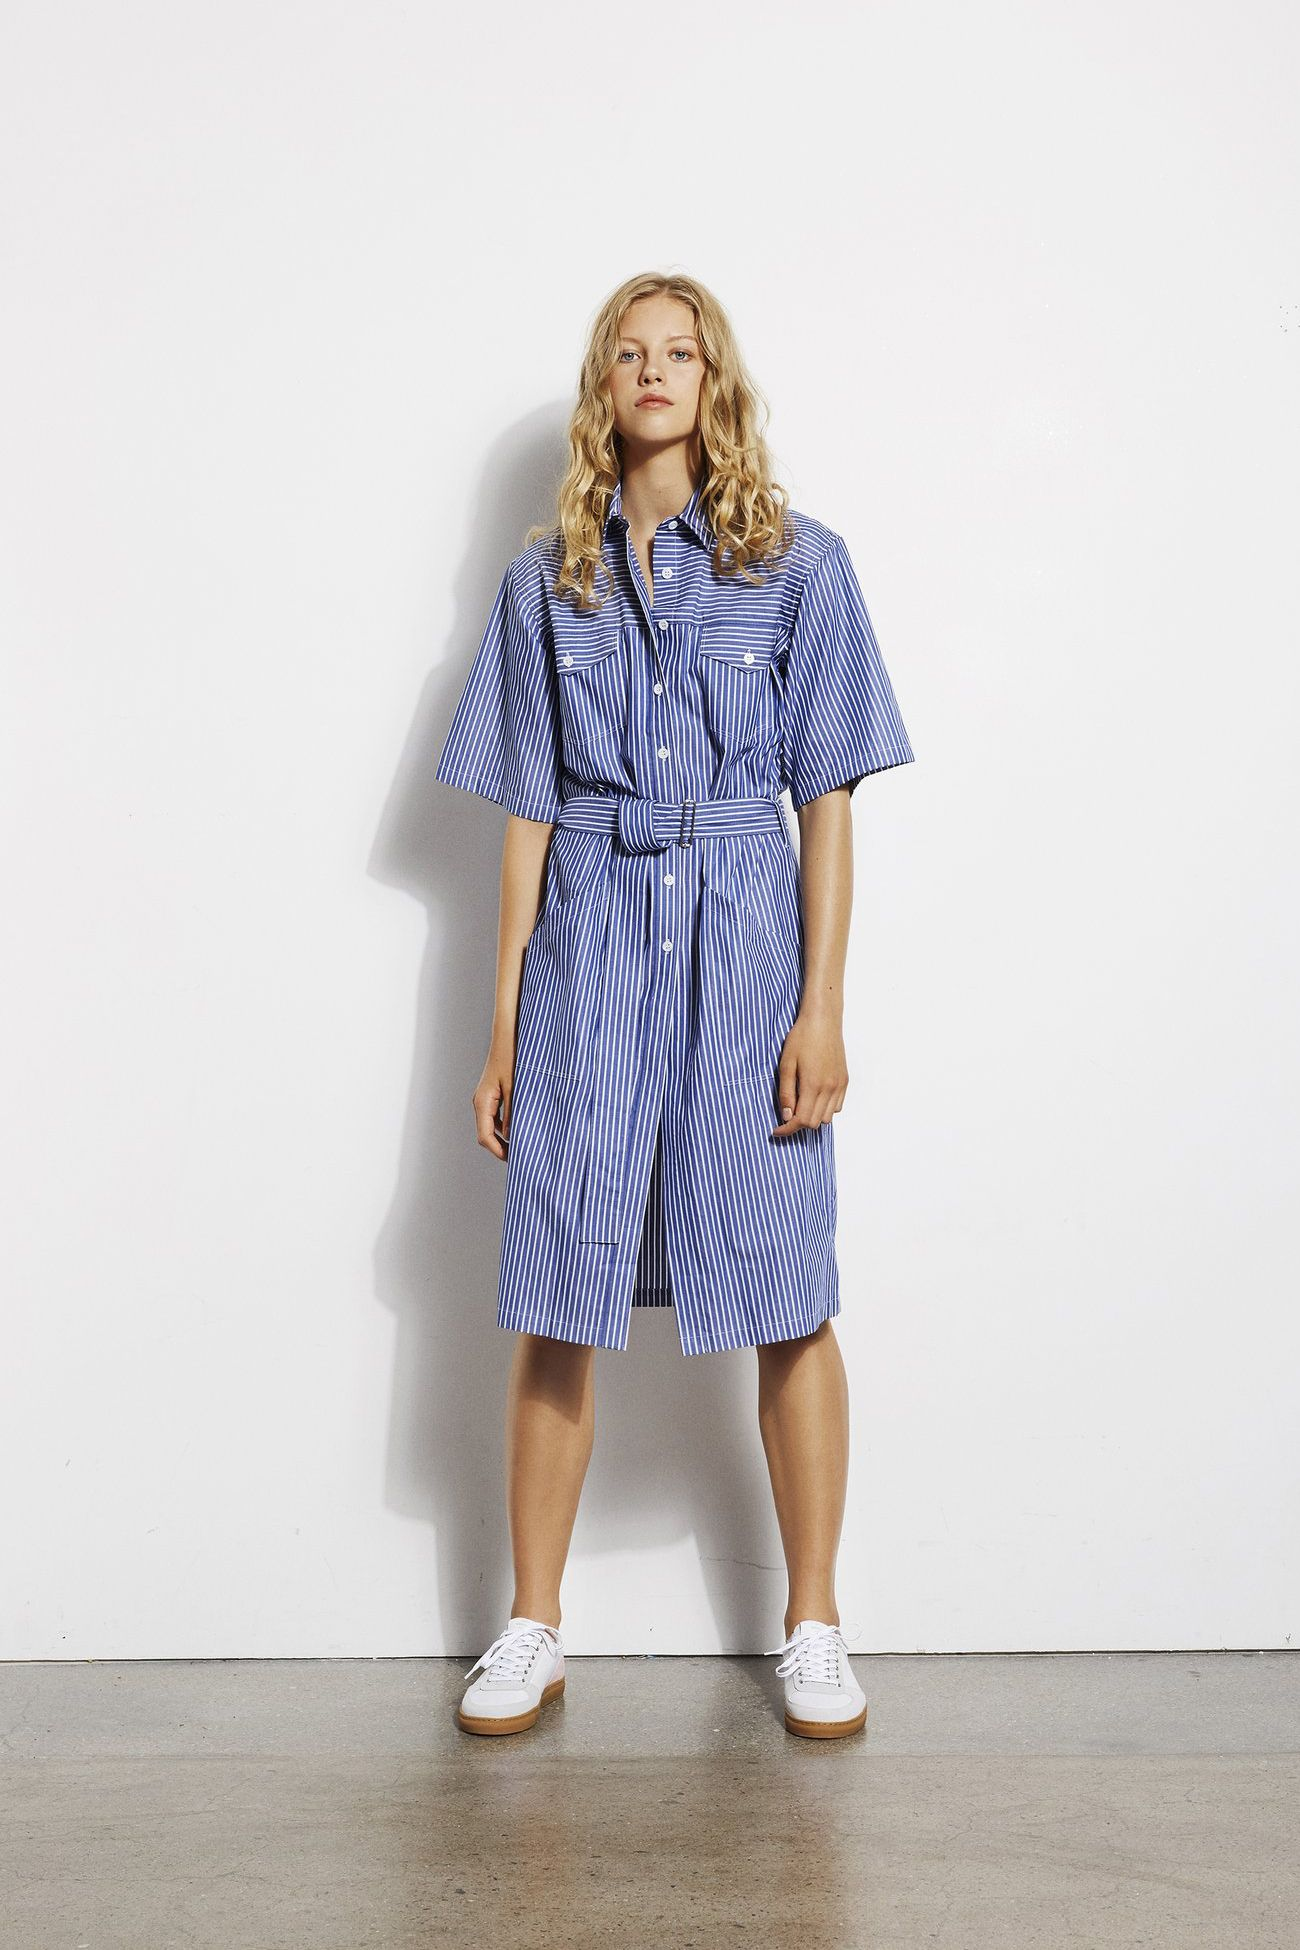 Danish fashion designers online 90